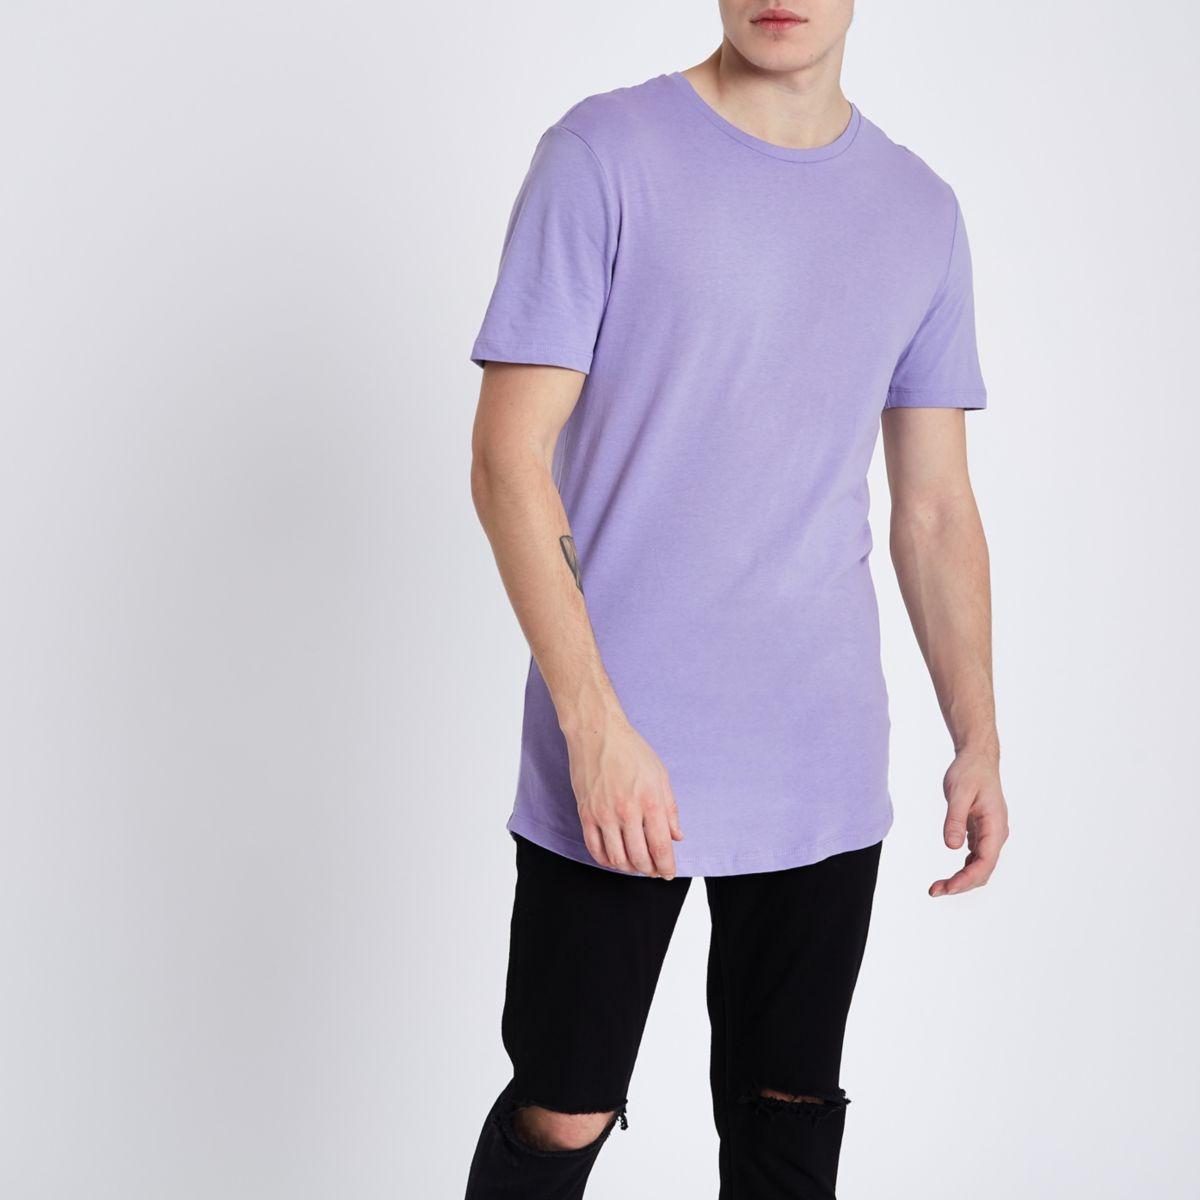 Lilac purple crew neck curved hem T-shirt